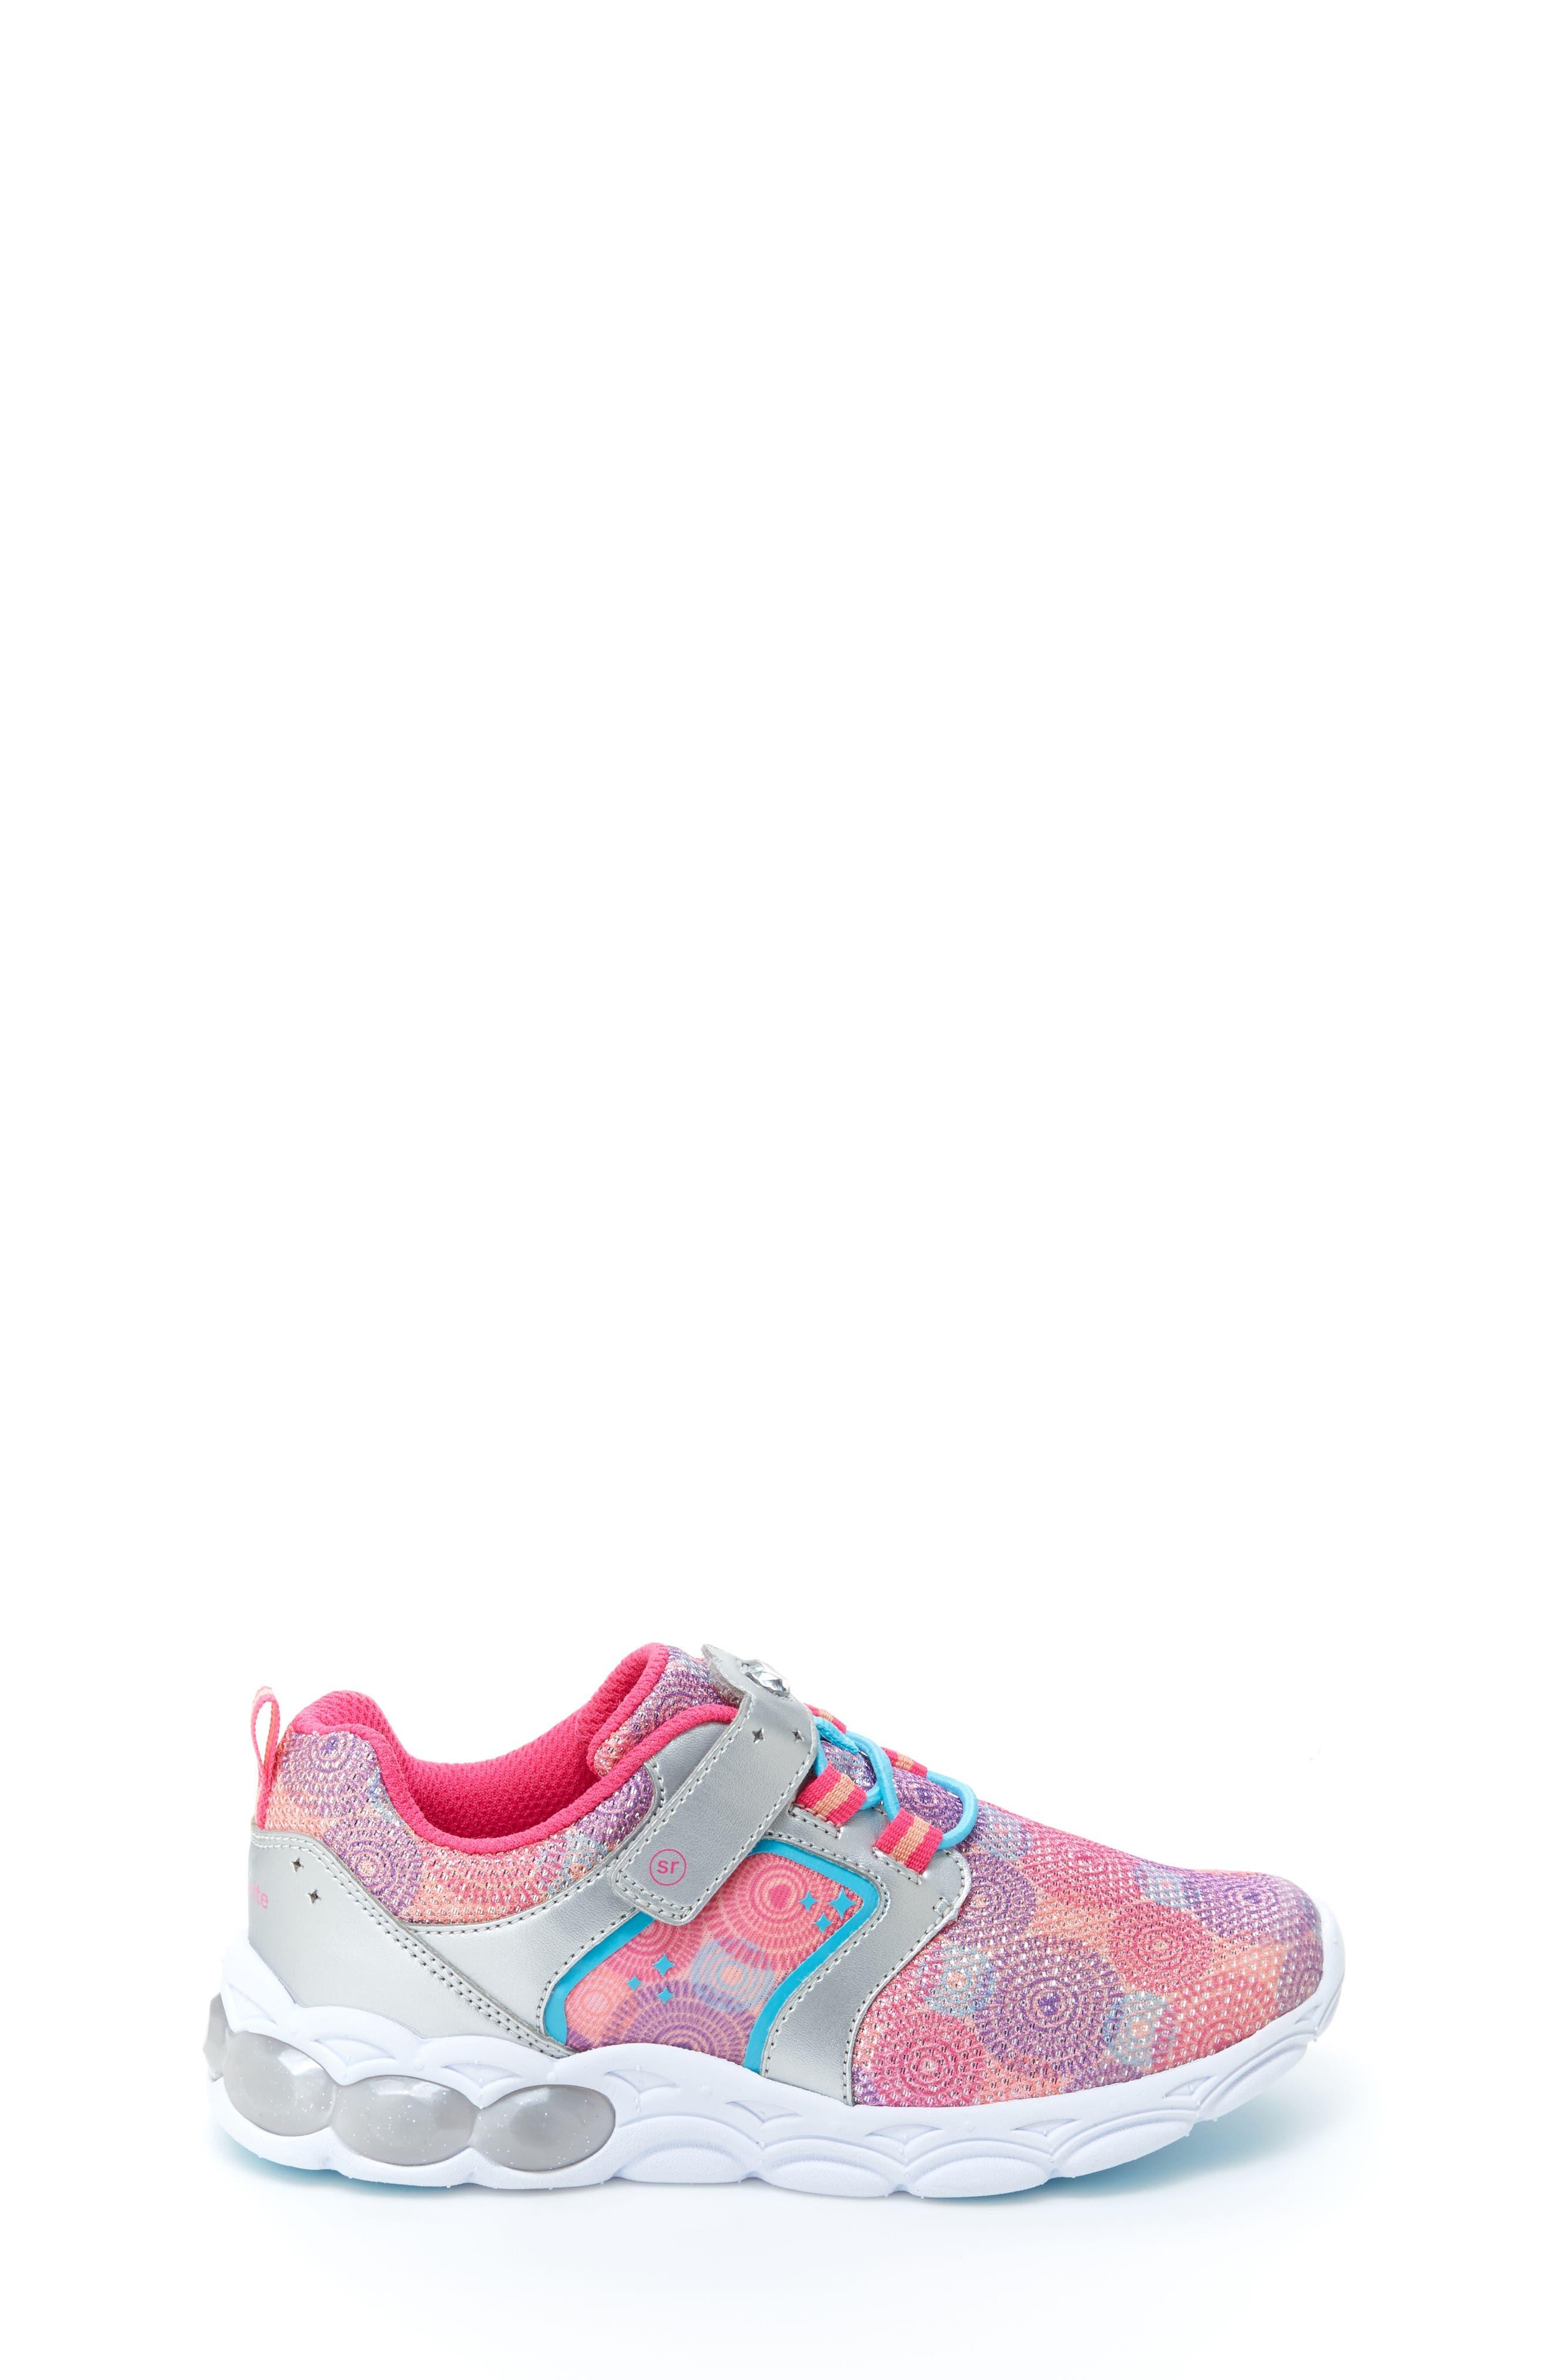 Lights Lively Light-Up Sneaker,                             Alternate thumbnail 2, color,                             Rainbow